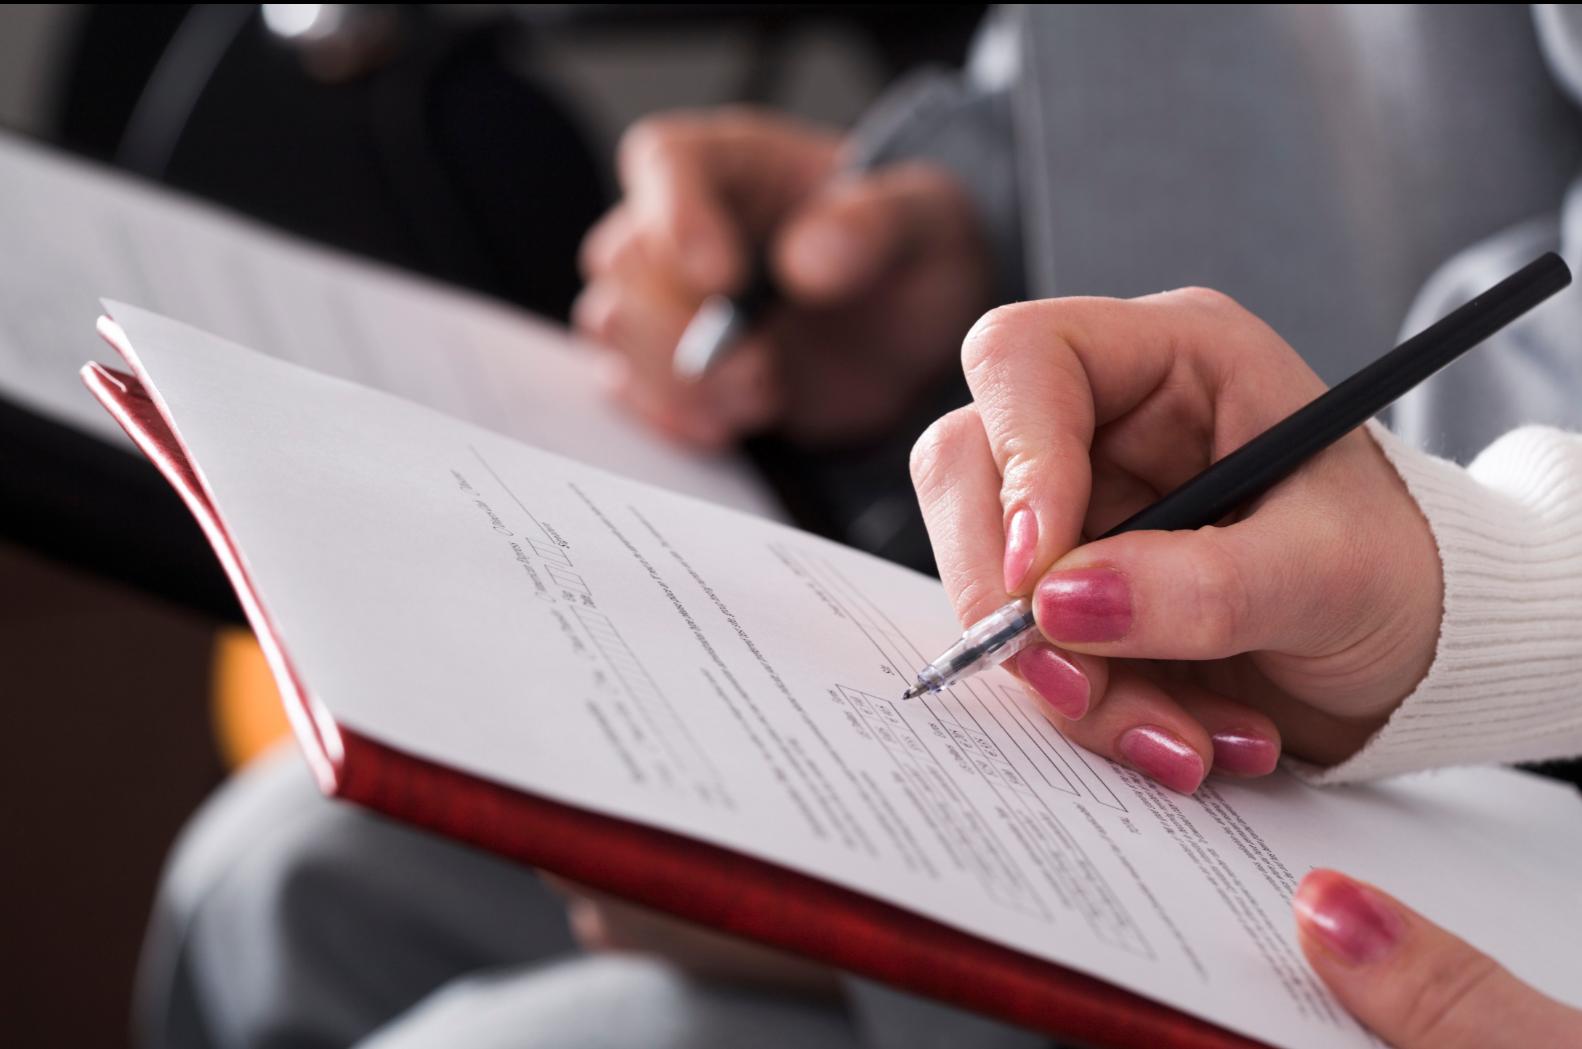 Read more about the article 求職之路:撰寫履歷的技巧及注意事項,教你寫出一篇簡單清楚的履歷!